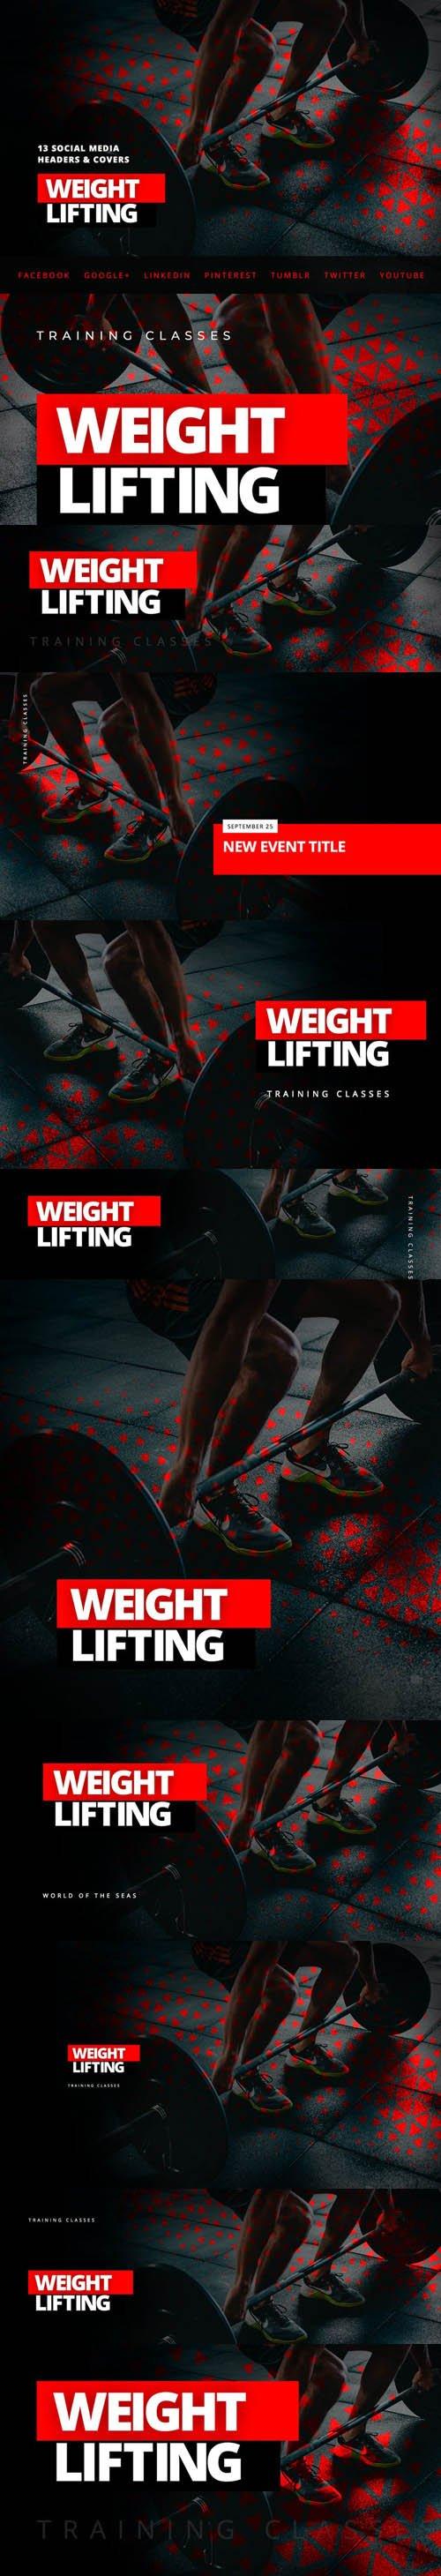 Weightlifting Fitness - Social Media Kit